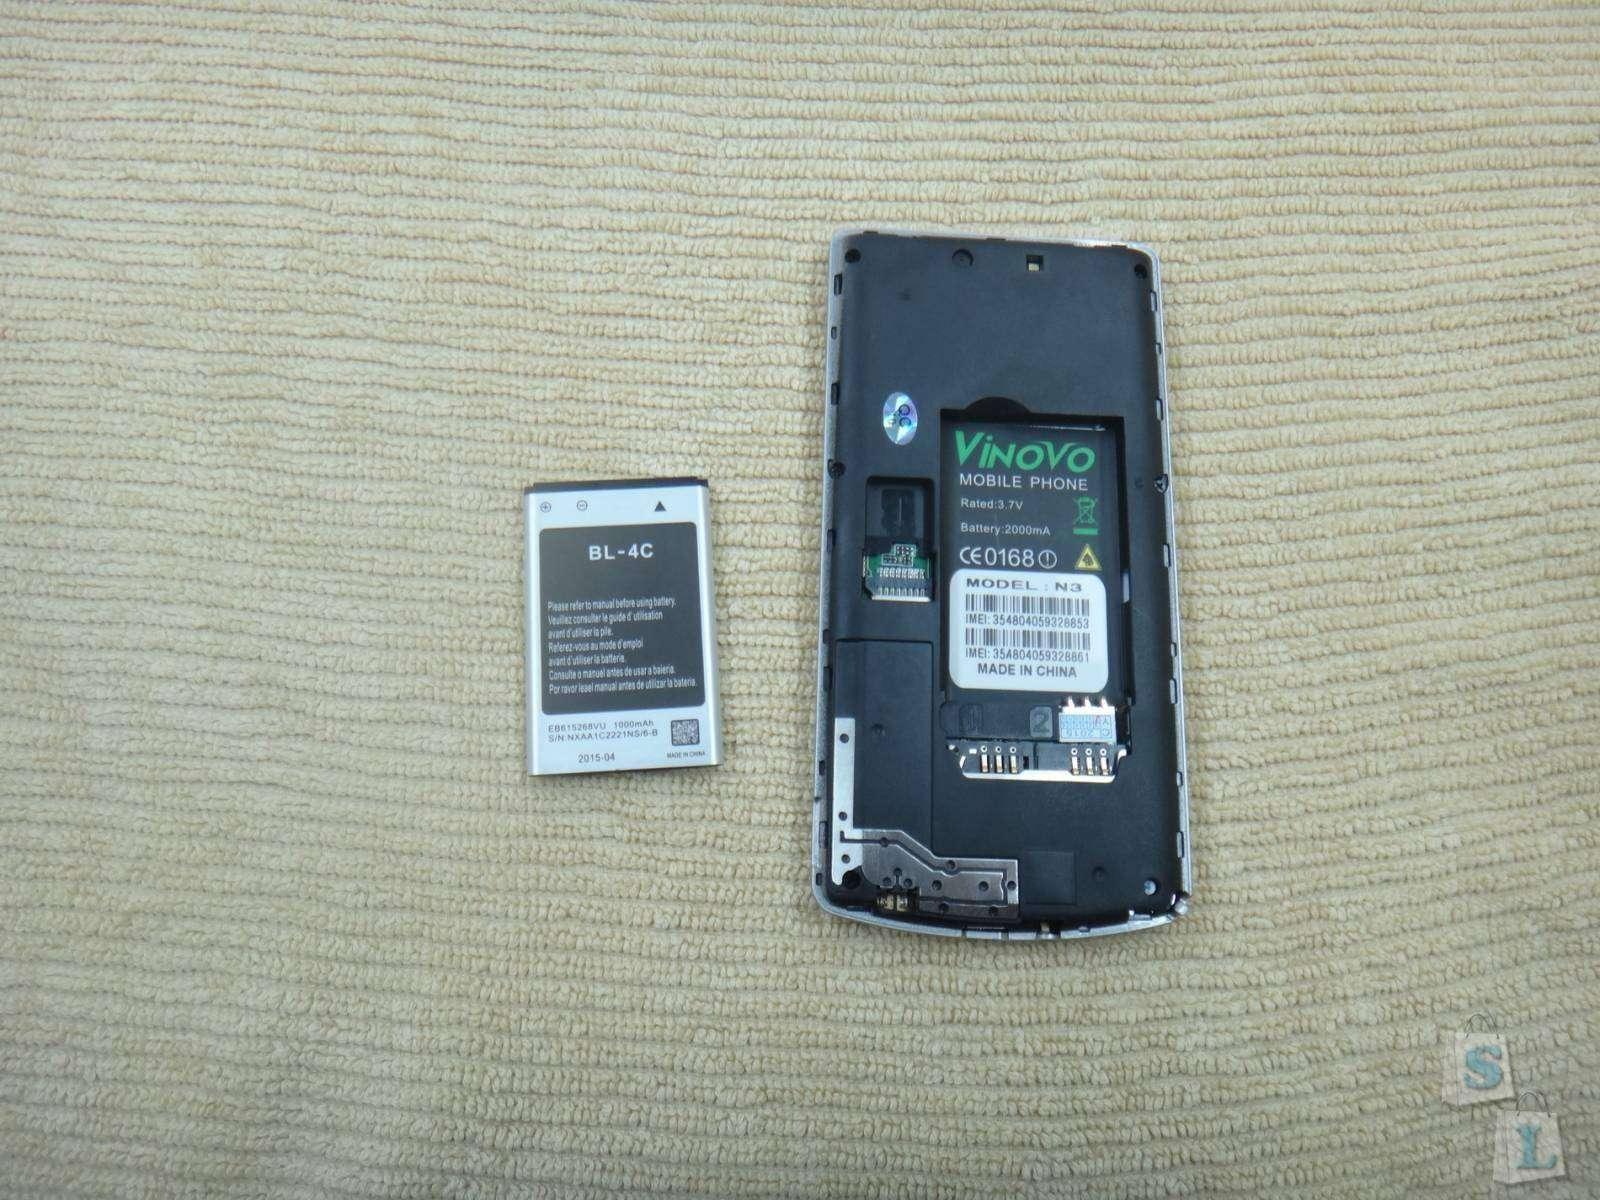 GearBest: Обзор телефона Vinovo N3 4.0 Phone FM Dual SIM MP3 который немного похож на смартфон